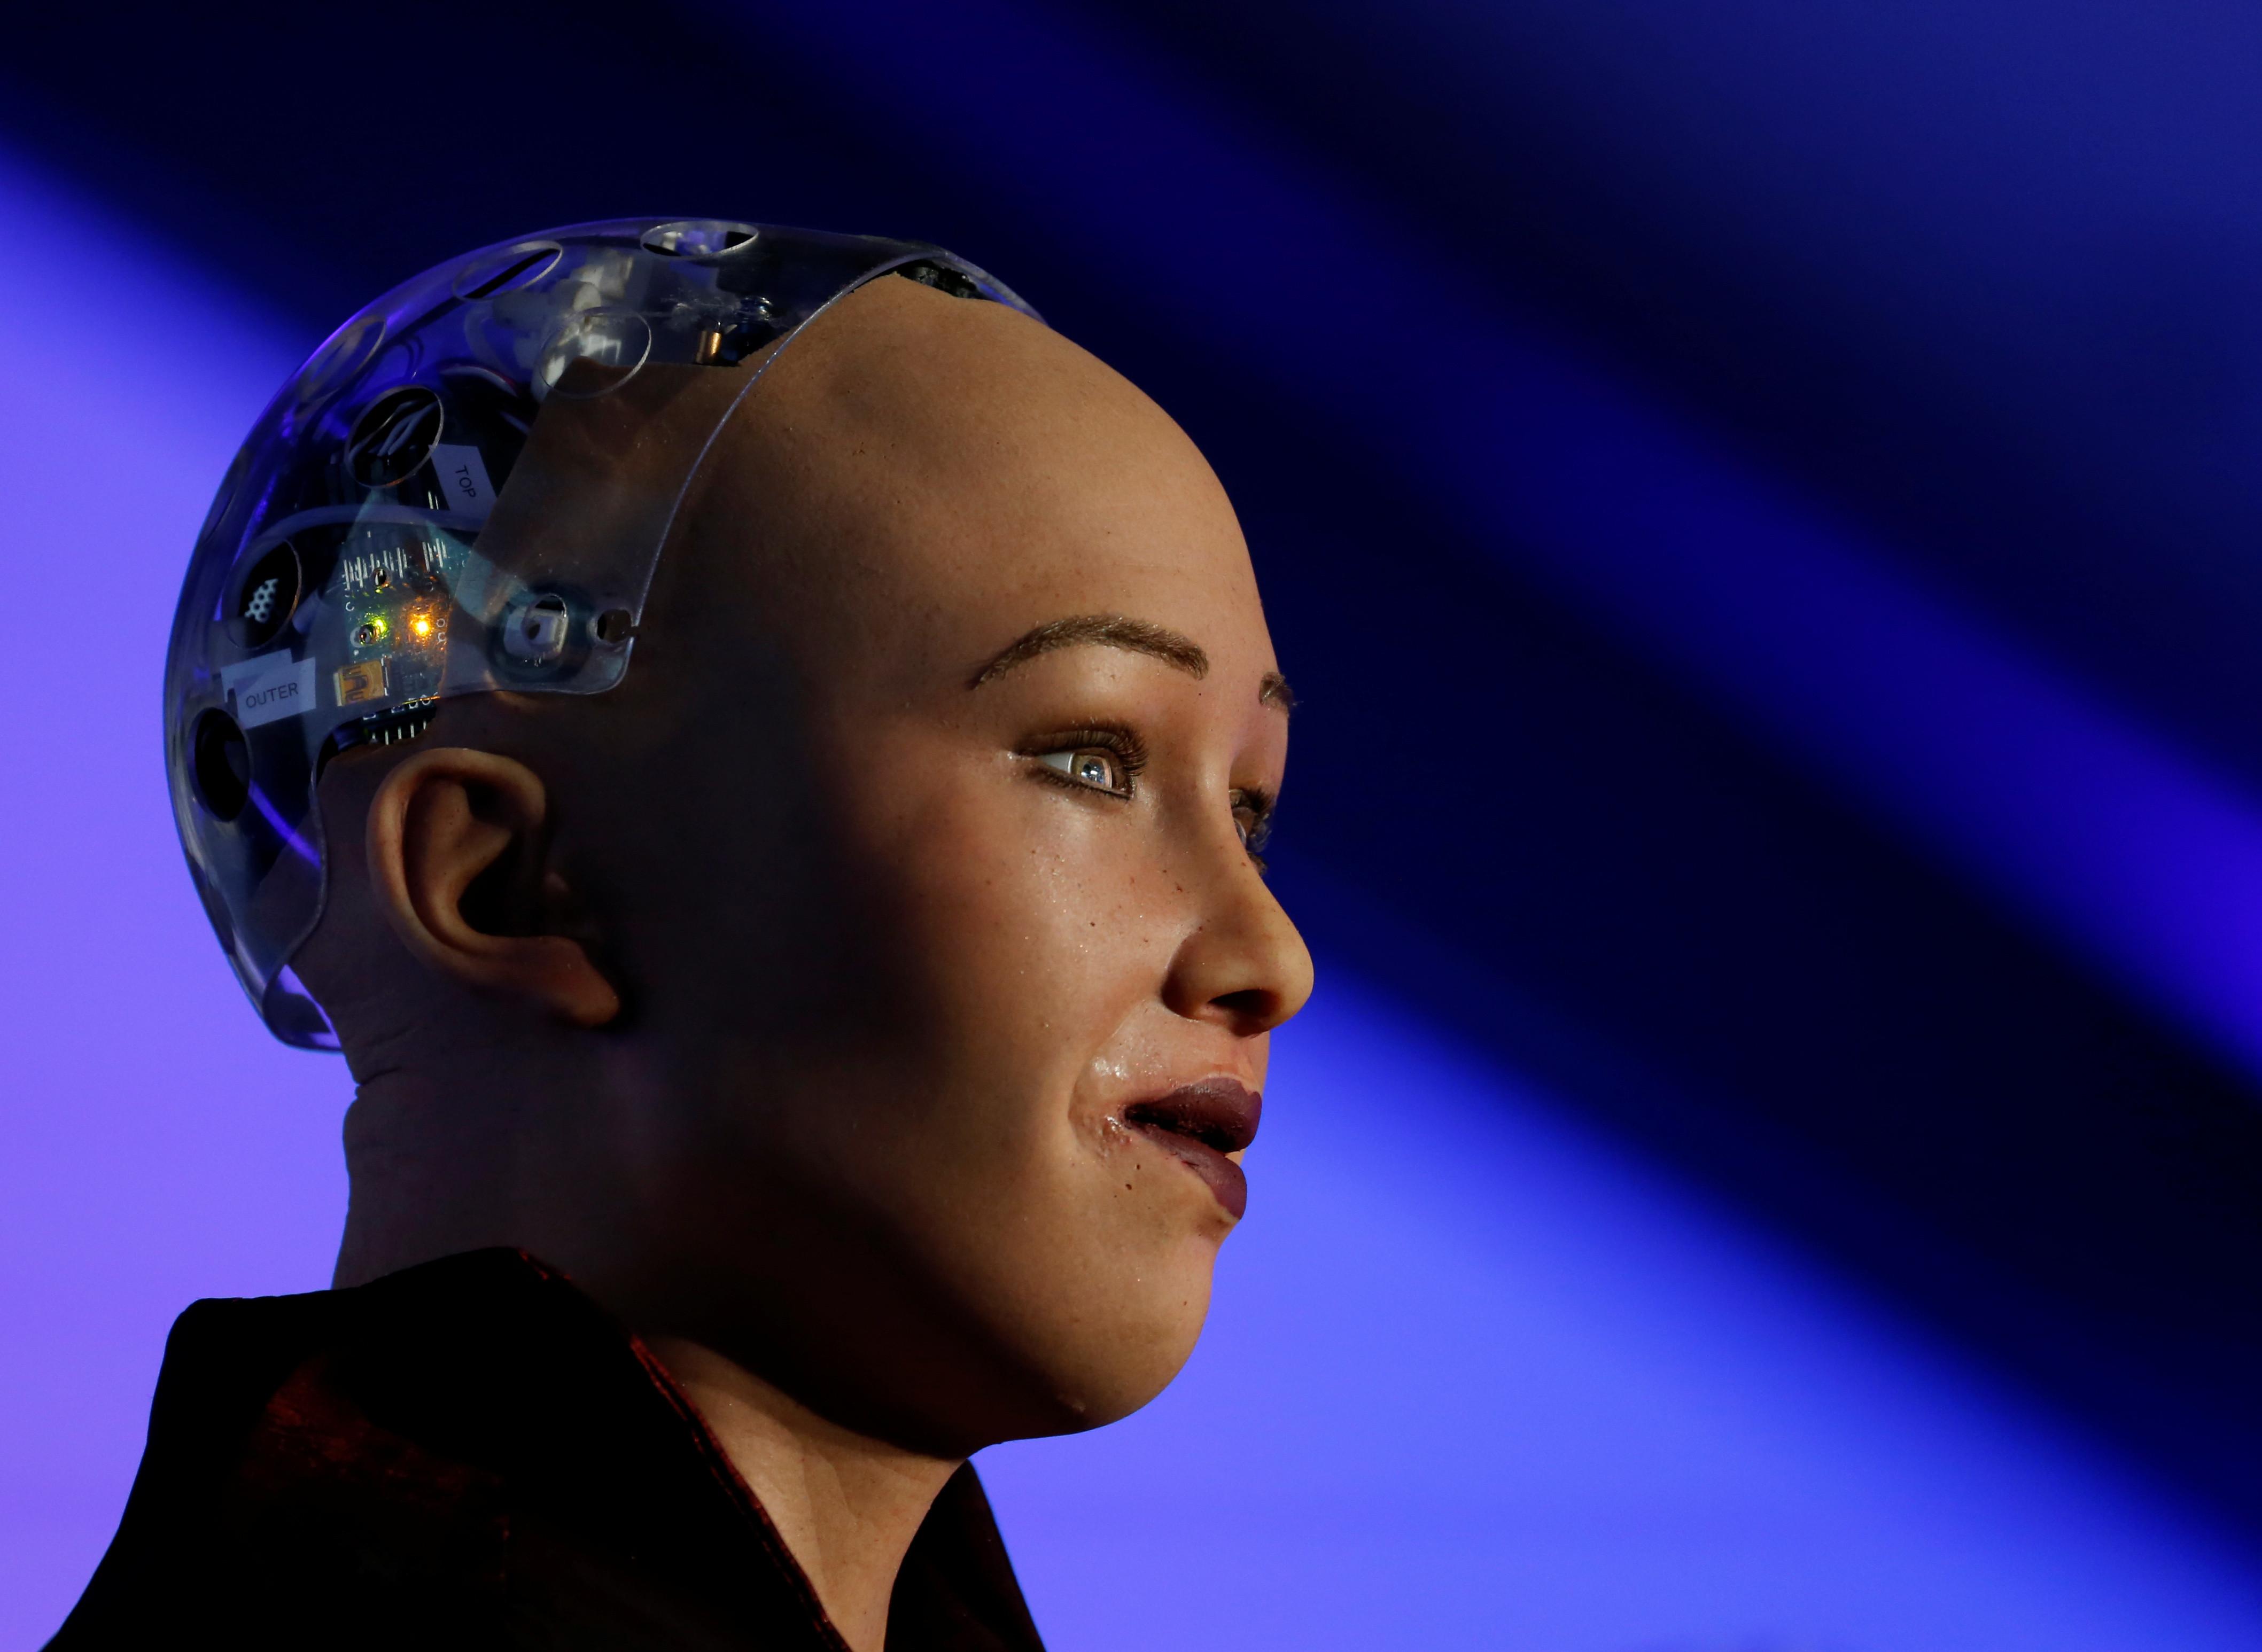 The humanoid robot Sophia, a creation of Hanson Robotics, is seen during a presentation at the Malta Blockchain Summit in St Julian's, Malta November 1, 2018. REUTERS/Darrin Zammit Lupi - RC1BD8D71FE0